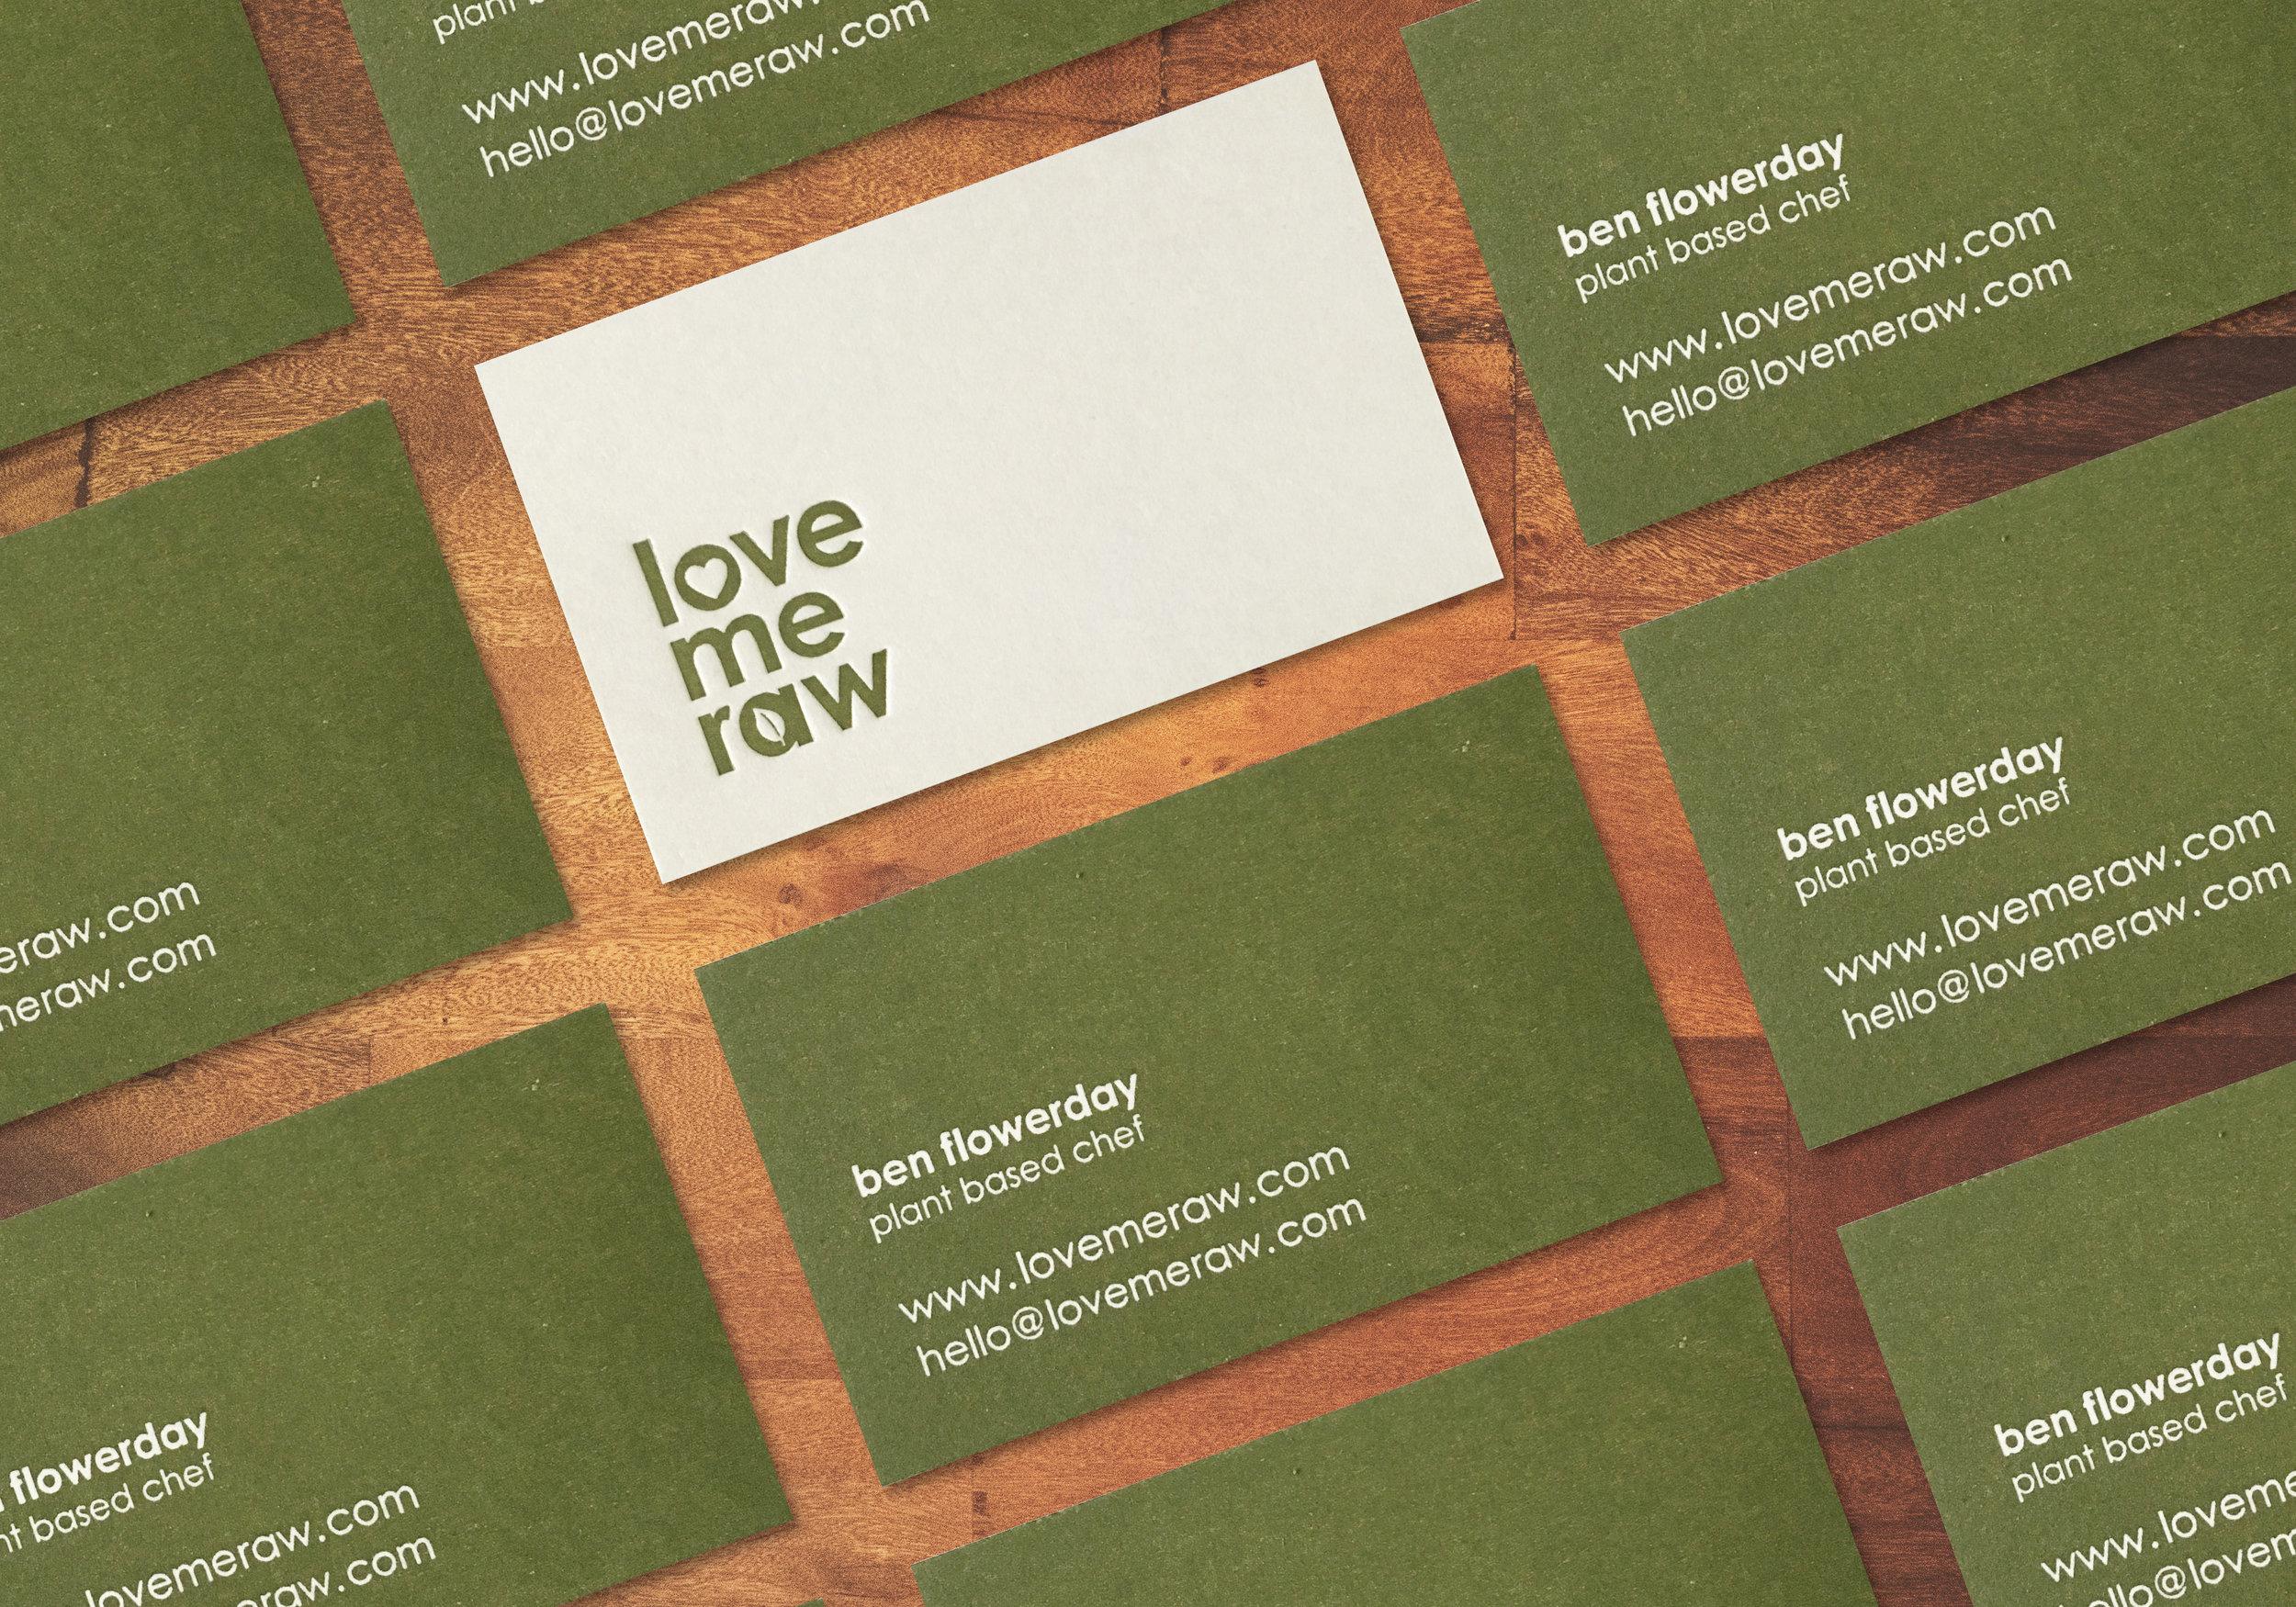 LOVE ME RAW  : BRAND IDENTITY + GRAPHIC DESIGN  view more...